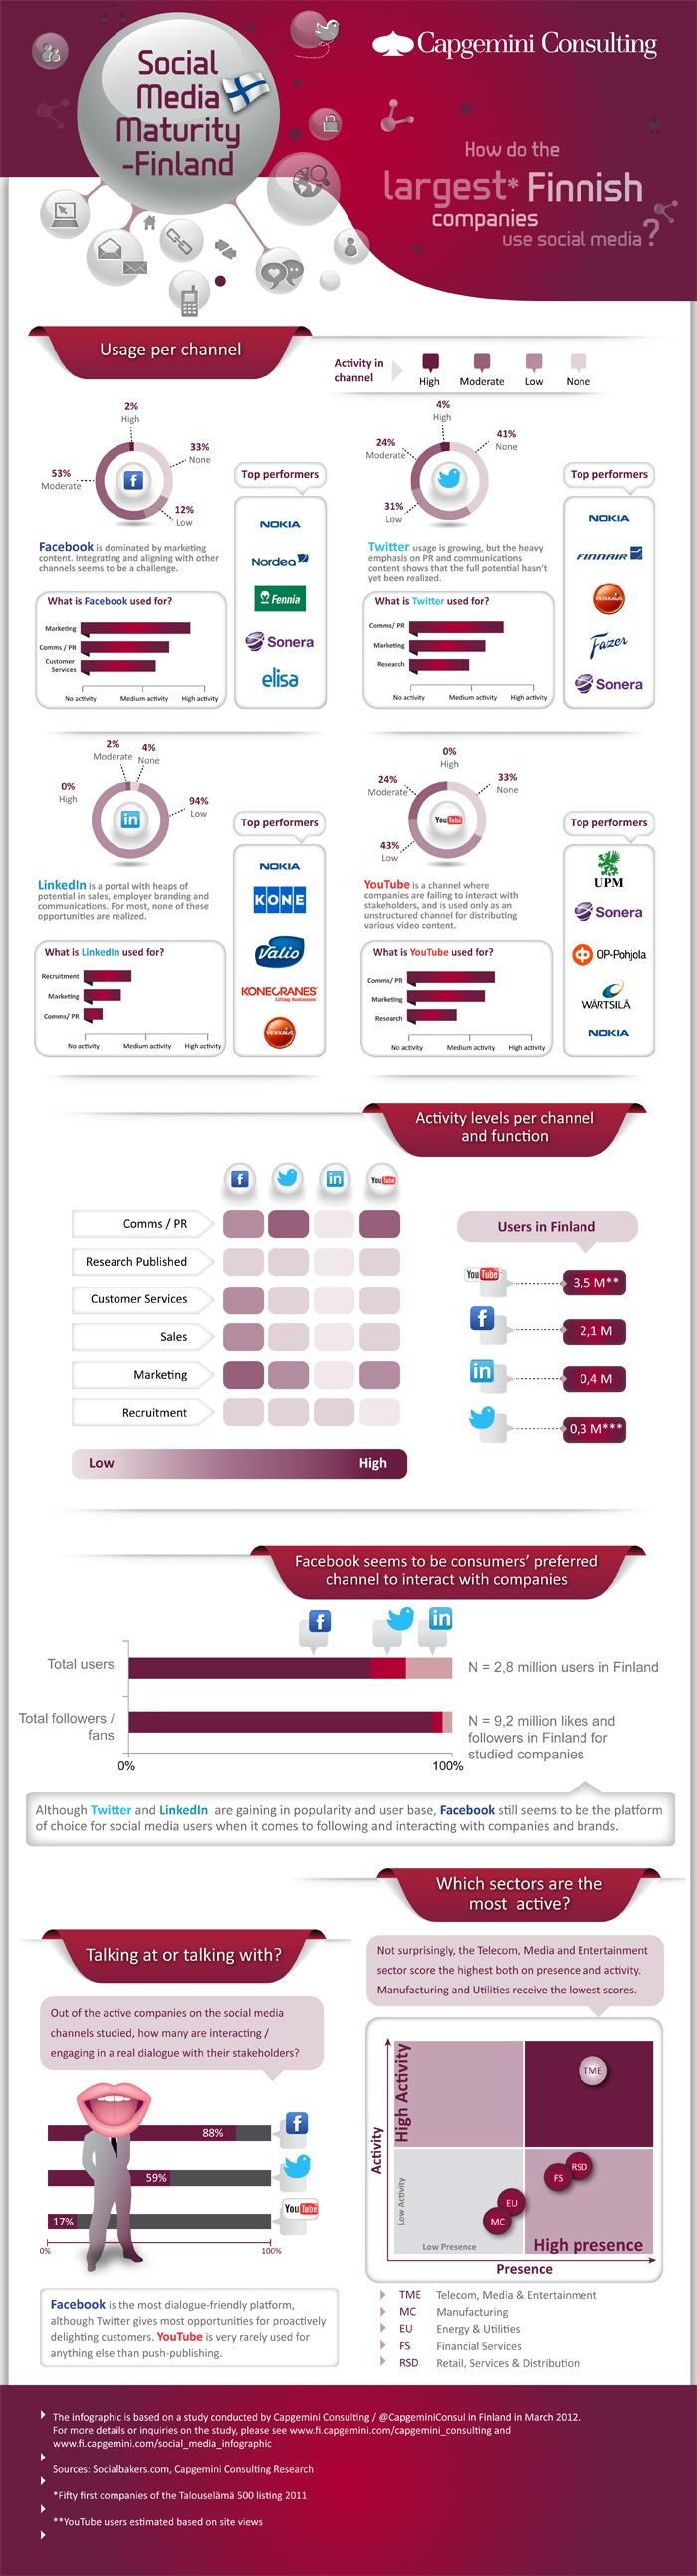 Social Media Maturity assessment of largest Finnish companies (by Cap Gemini)